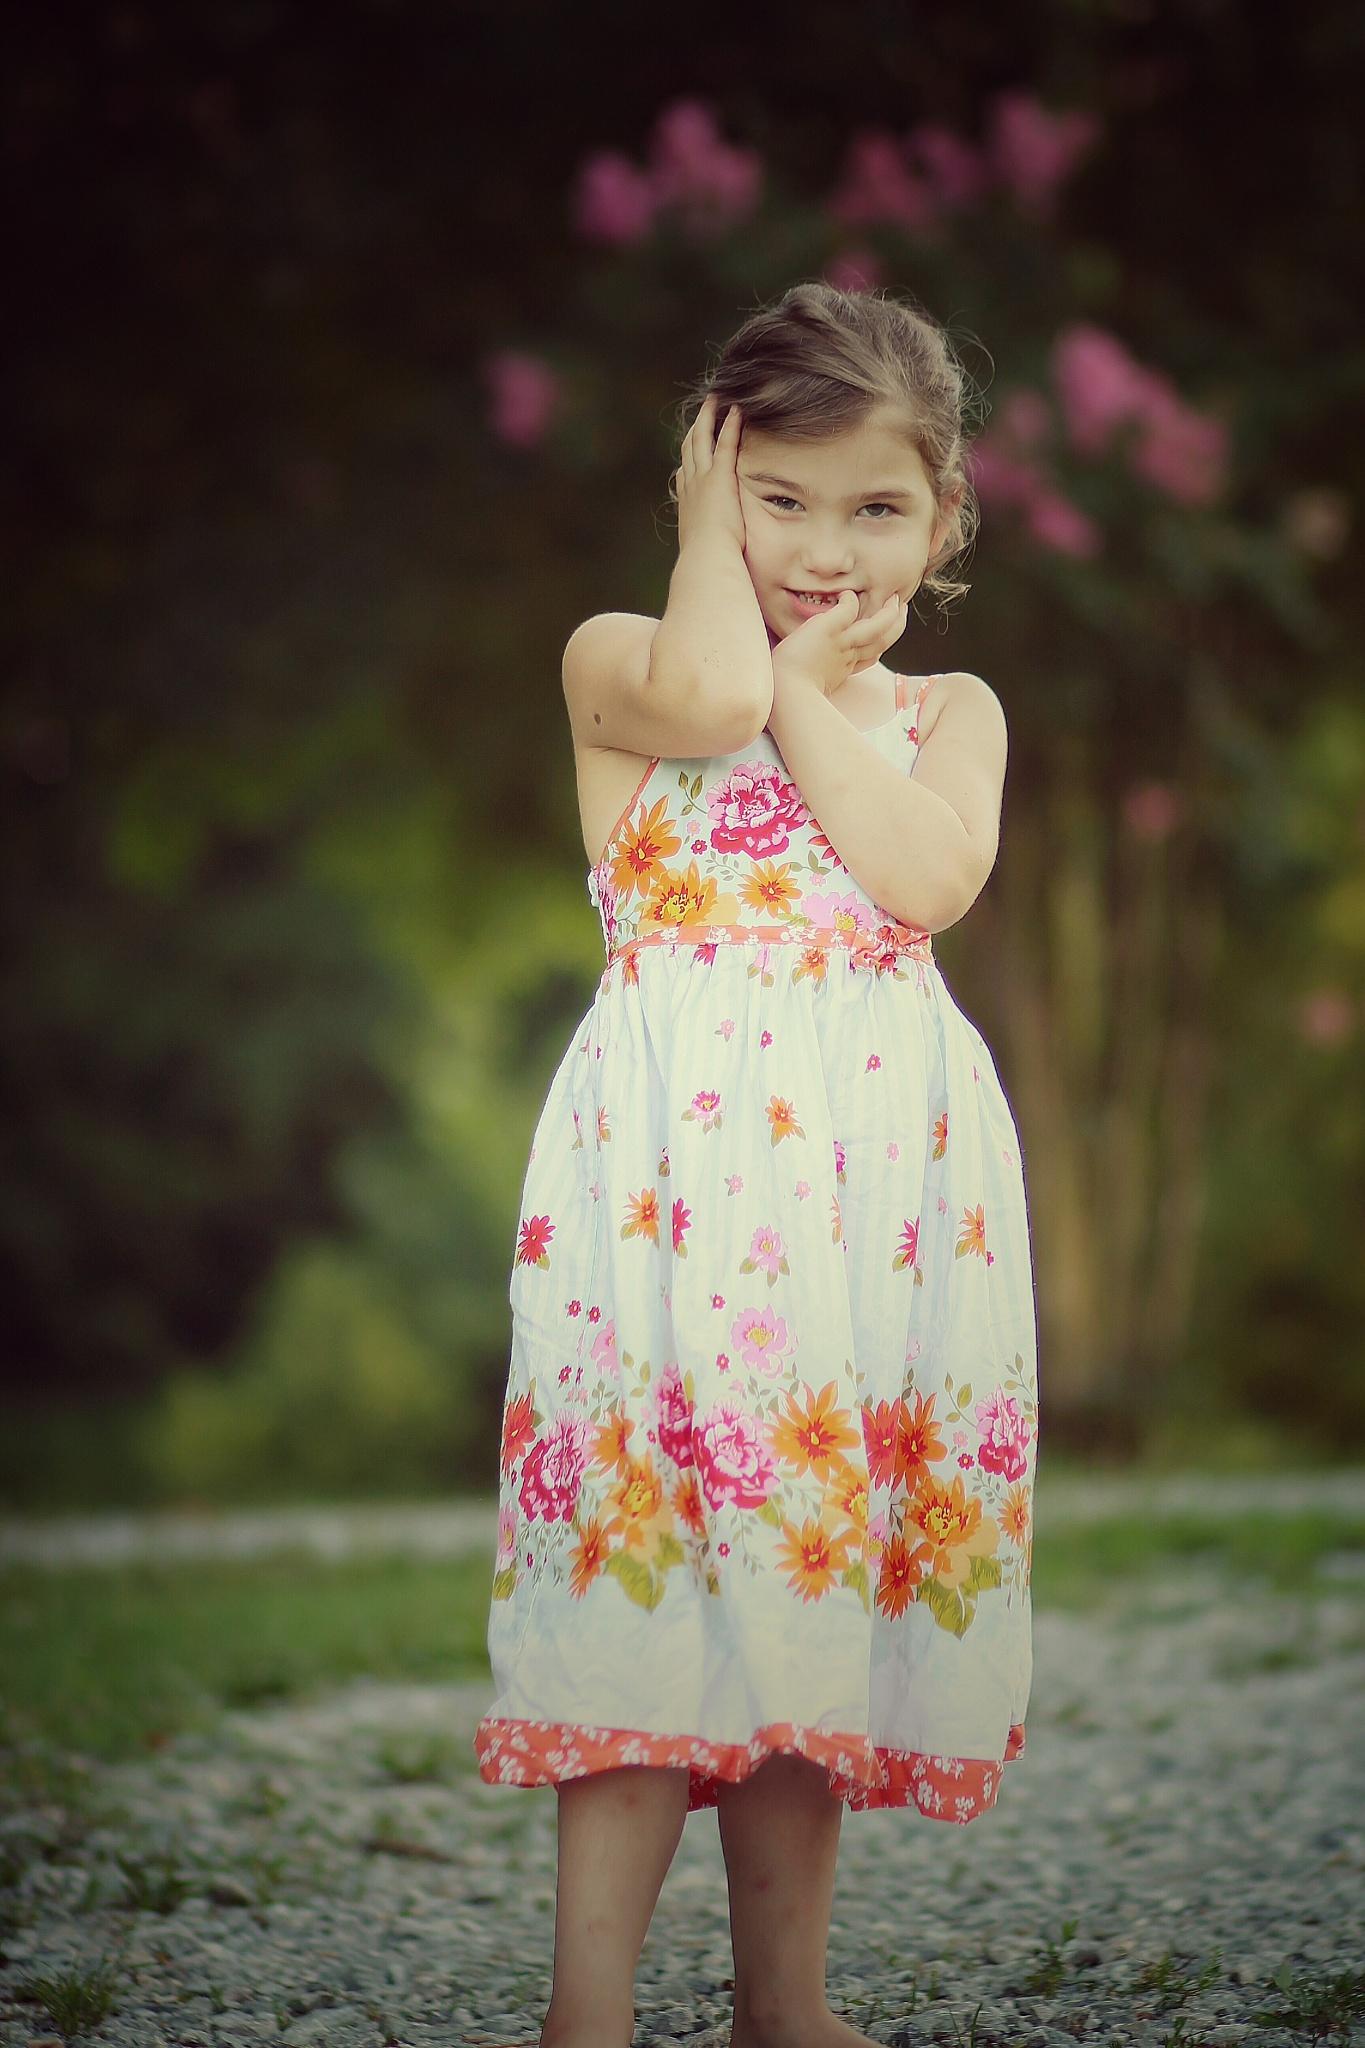 Innocence by Sonya Wilson